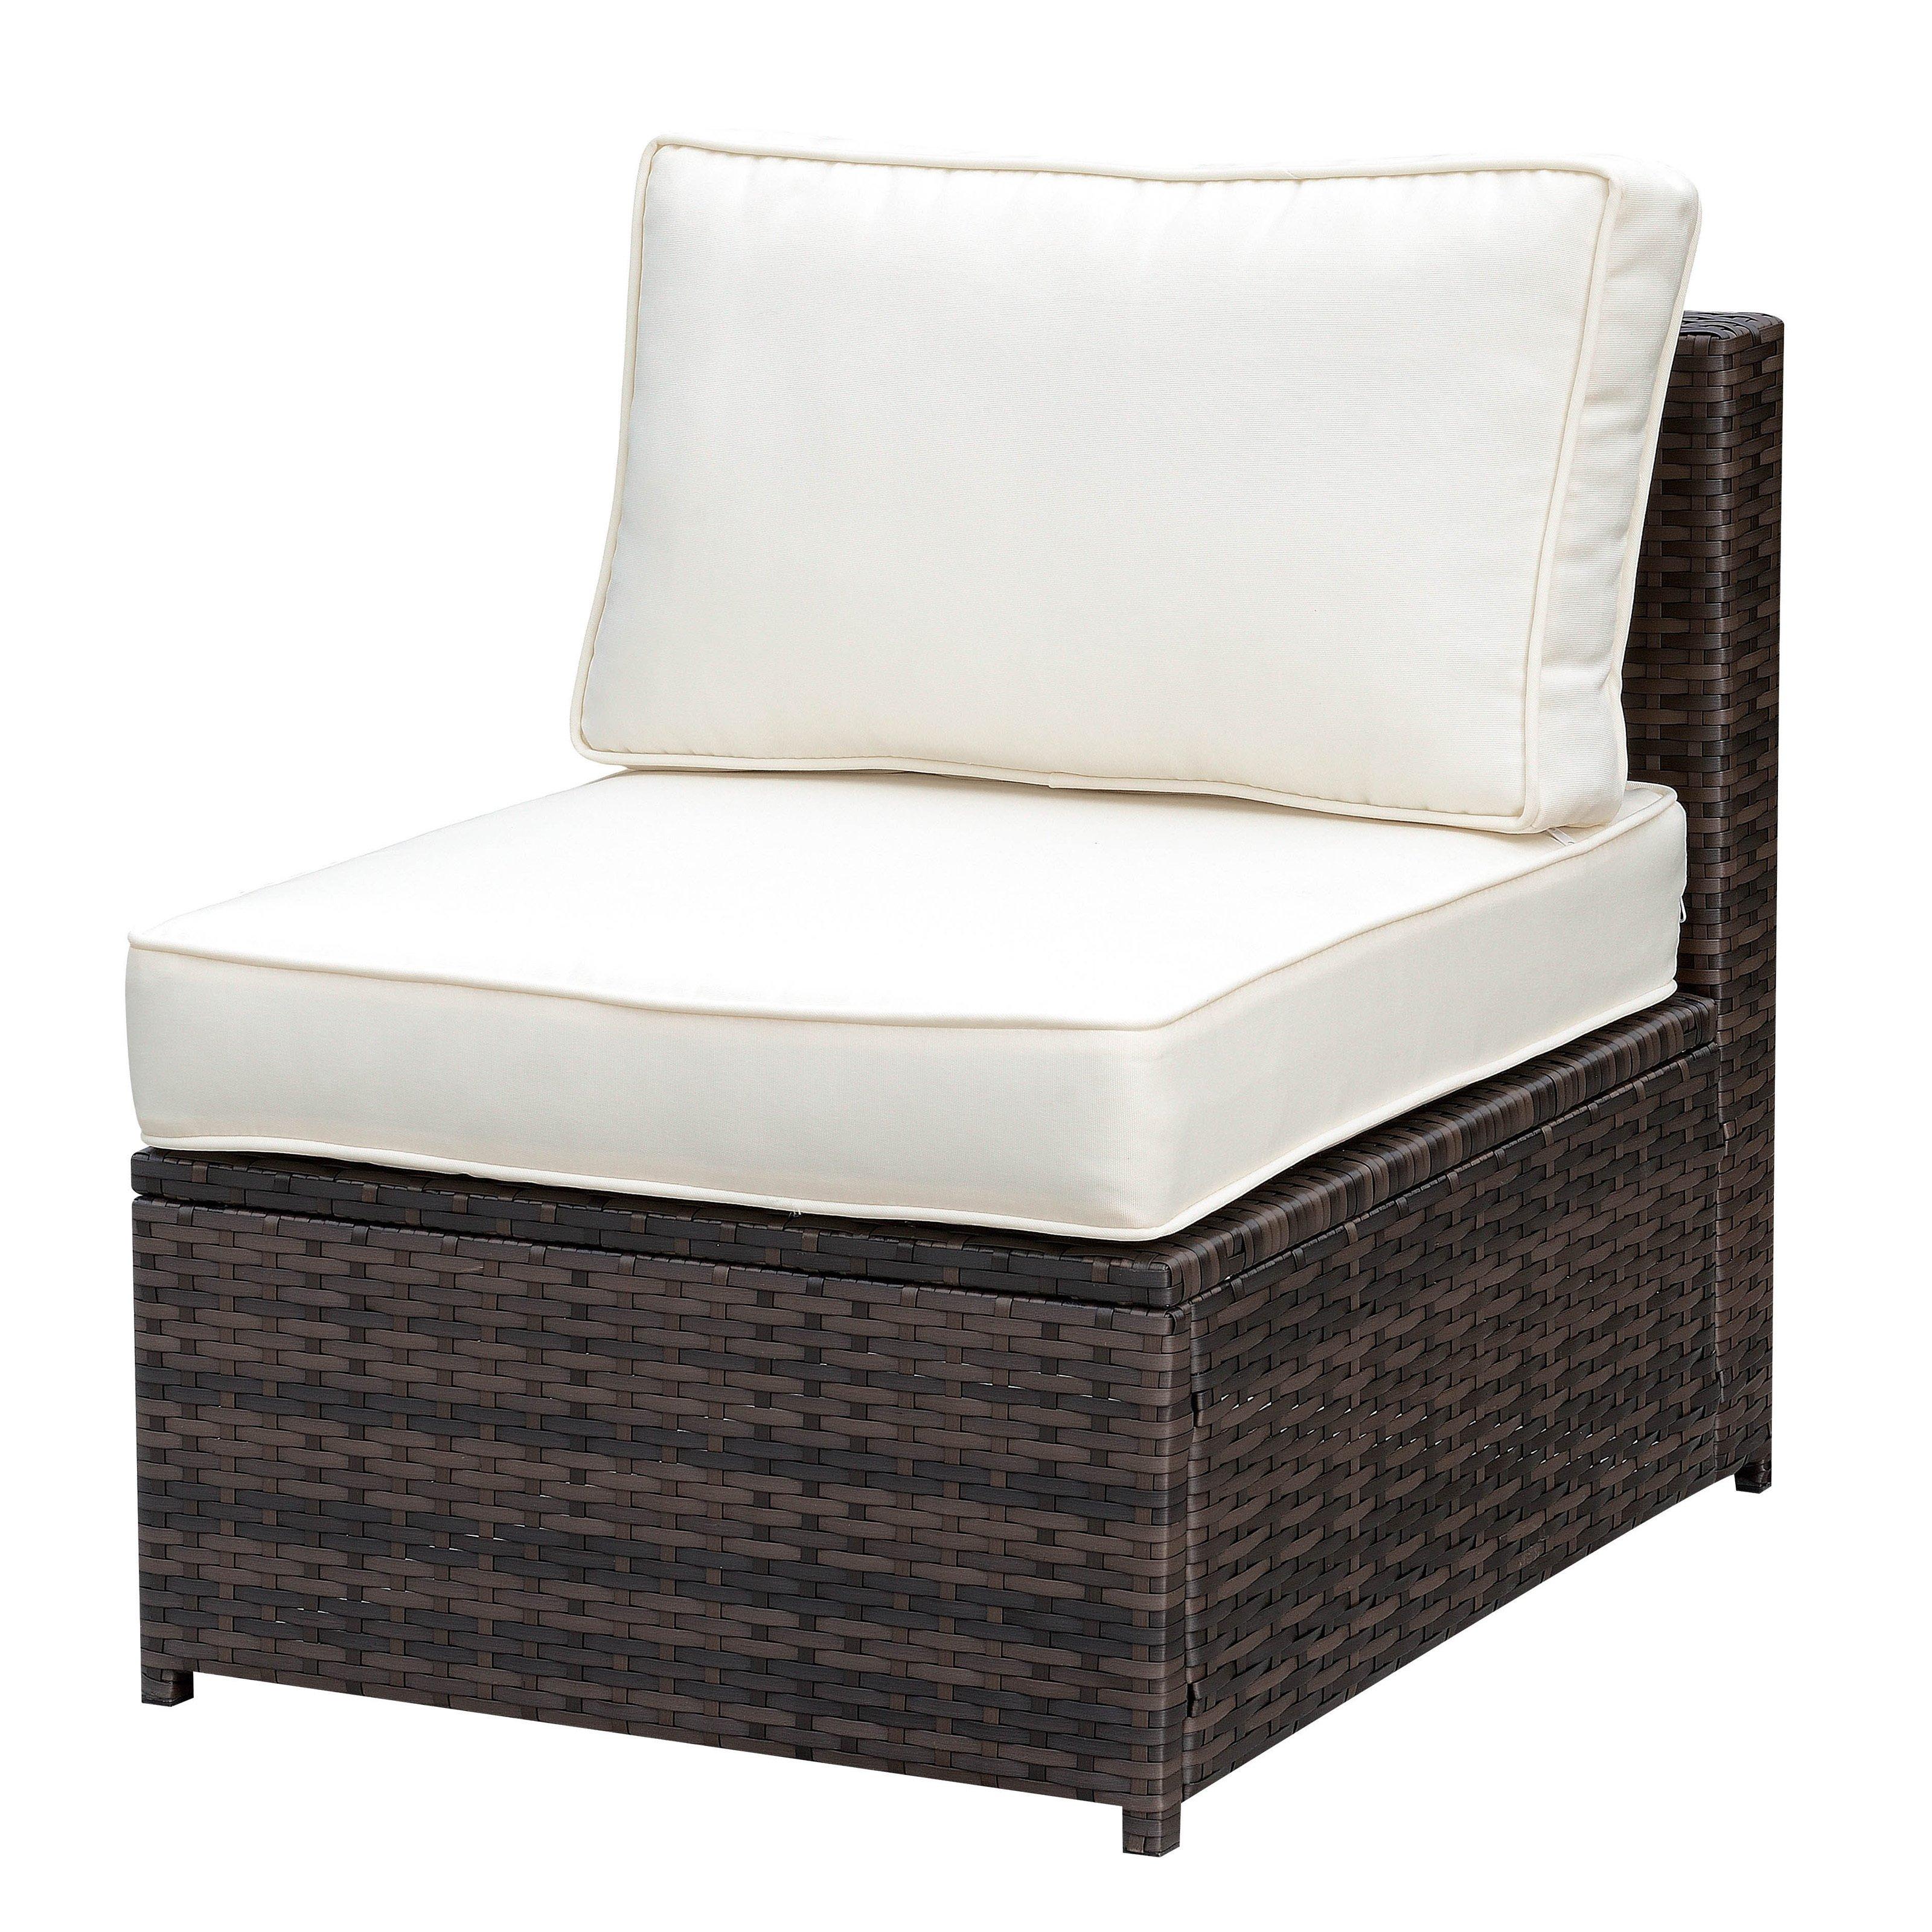 - HonTop 8 Inch Sofa Bed Memory Foam Sofa Folding Bed Queen Sofa Bed